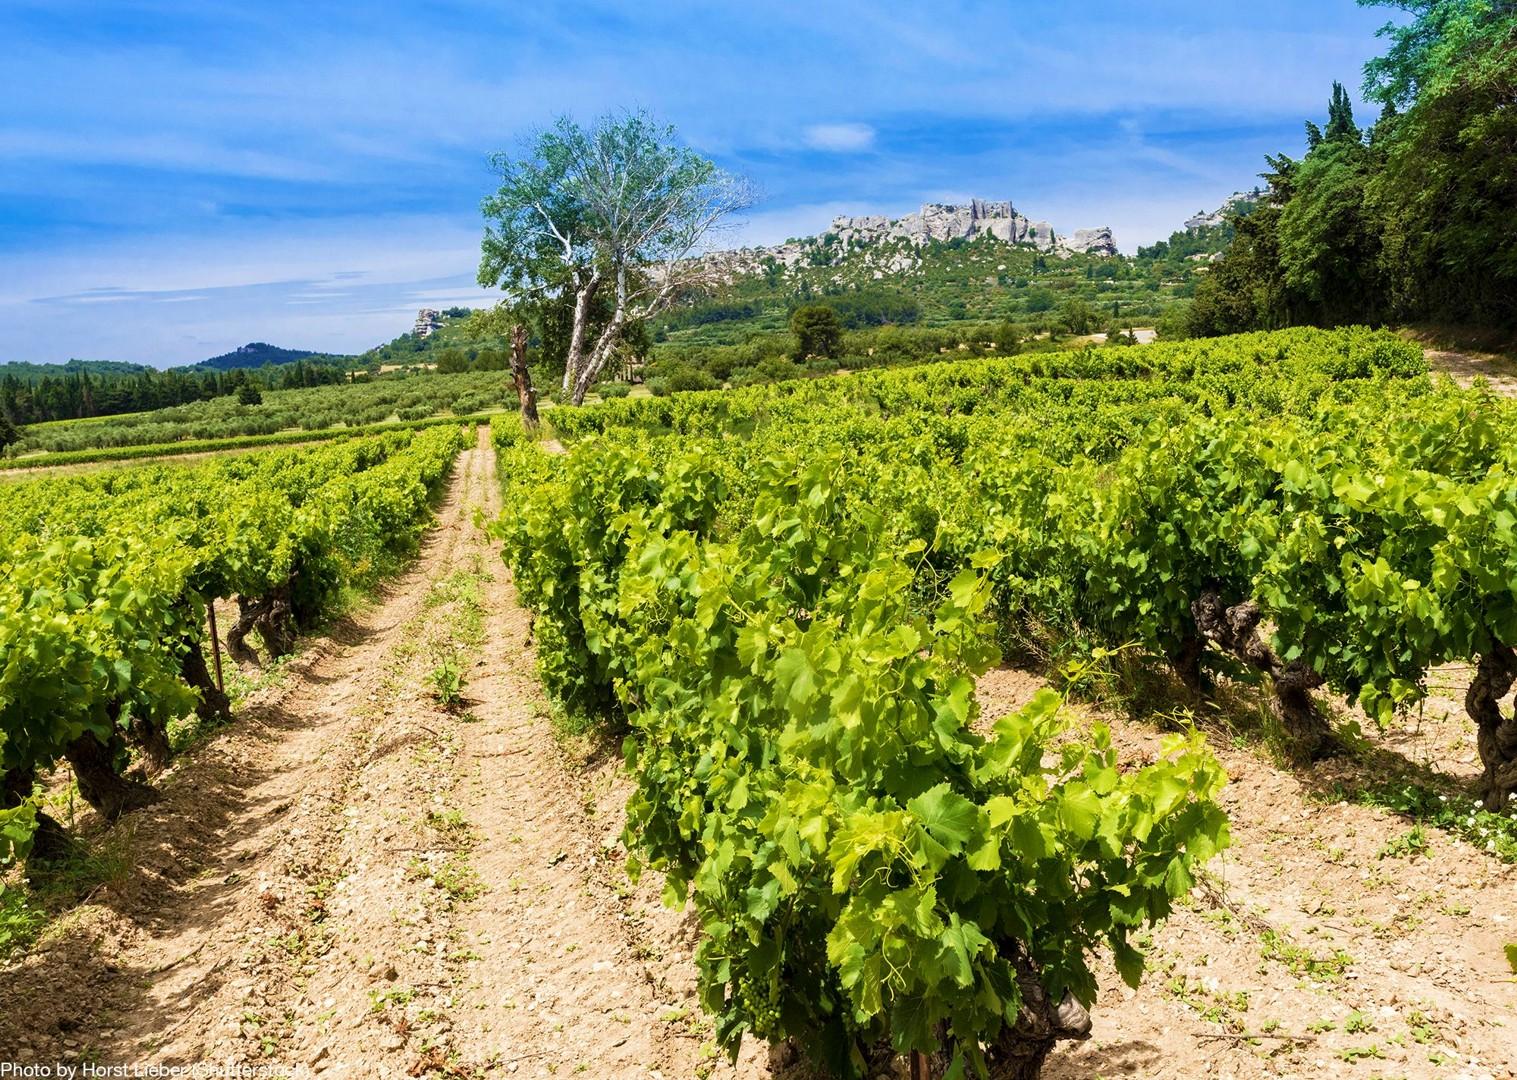 vineyards-of-côte-du-rhône-and-les-baux-wine-sampling-self-guided-provence-france.jpg - France - Provence - Self-Guided Leisure Cycling Holiday - Leisure Cycling